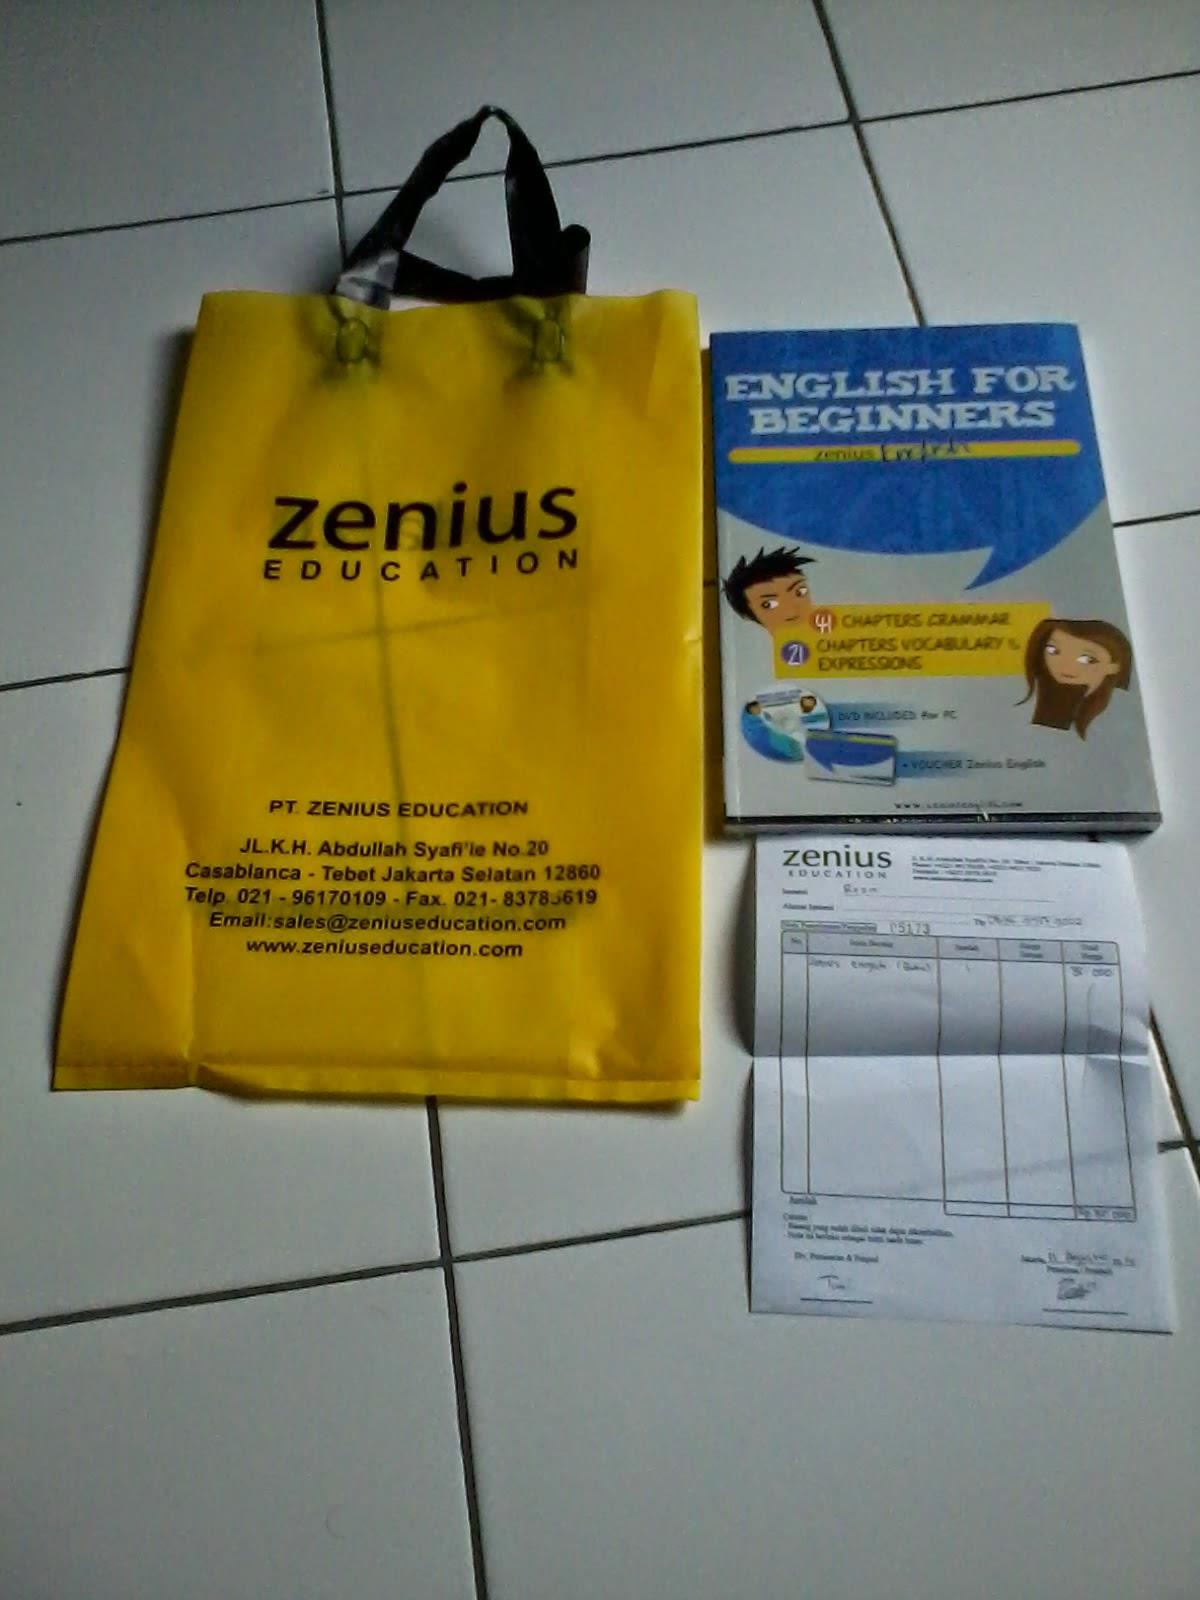 Hobby with zenius baik bulir zeniusenglish stopboris Choice Image